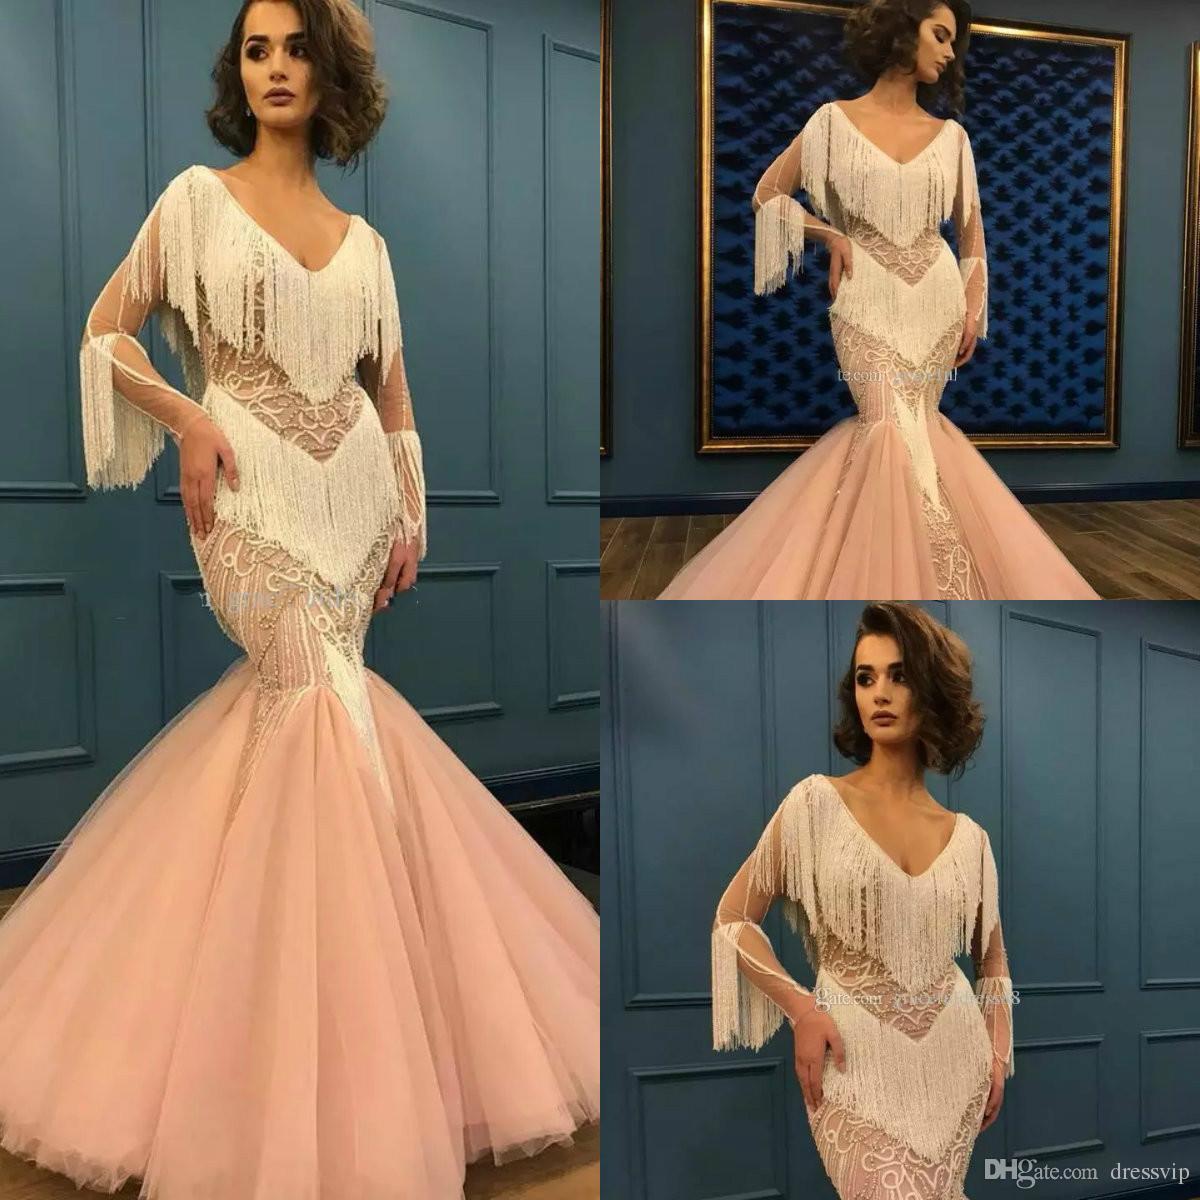 9db9e43c8cc7a Mermaid Prom Dresses Lace V Neck Beaded Tassel Floor Length Long Sleeve Elegant  Evening Dress Custom Made Plus Size Formal Party Gowns Prom Dresses  Designer ...